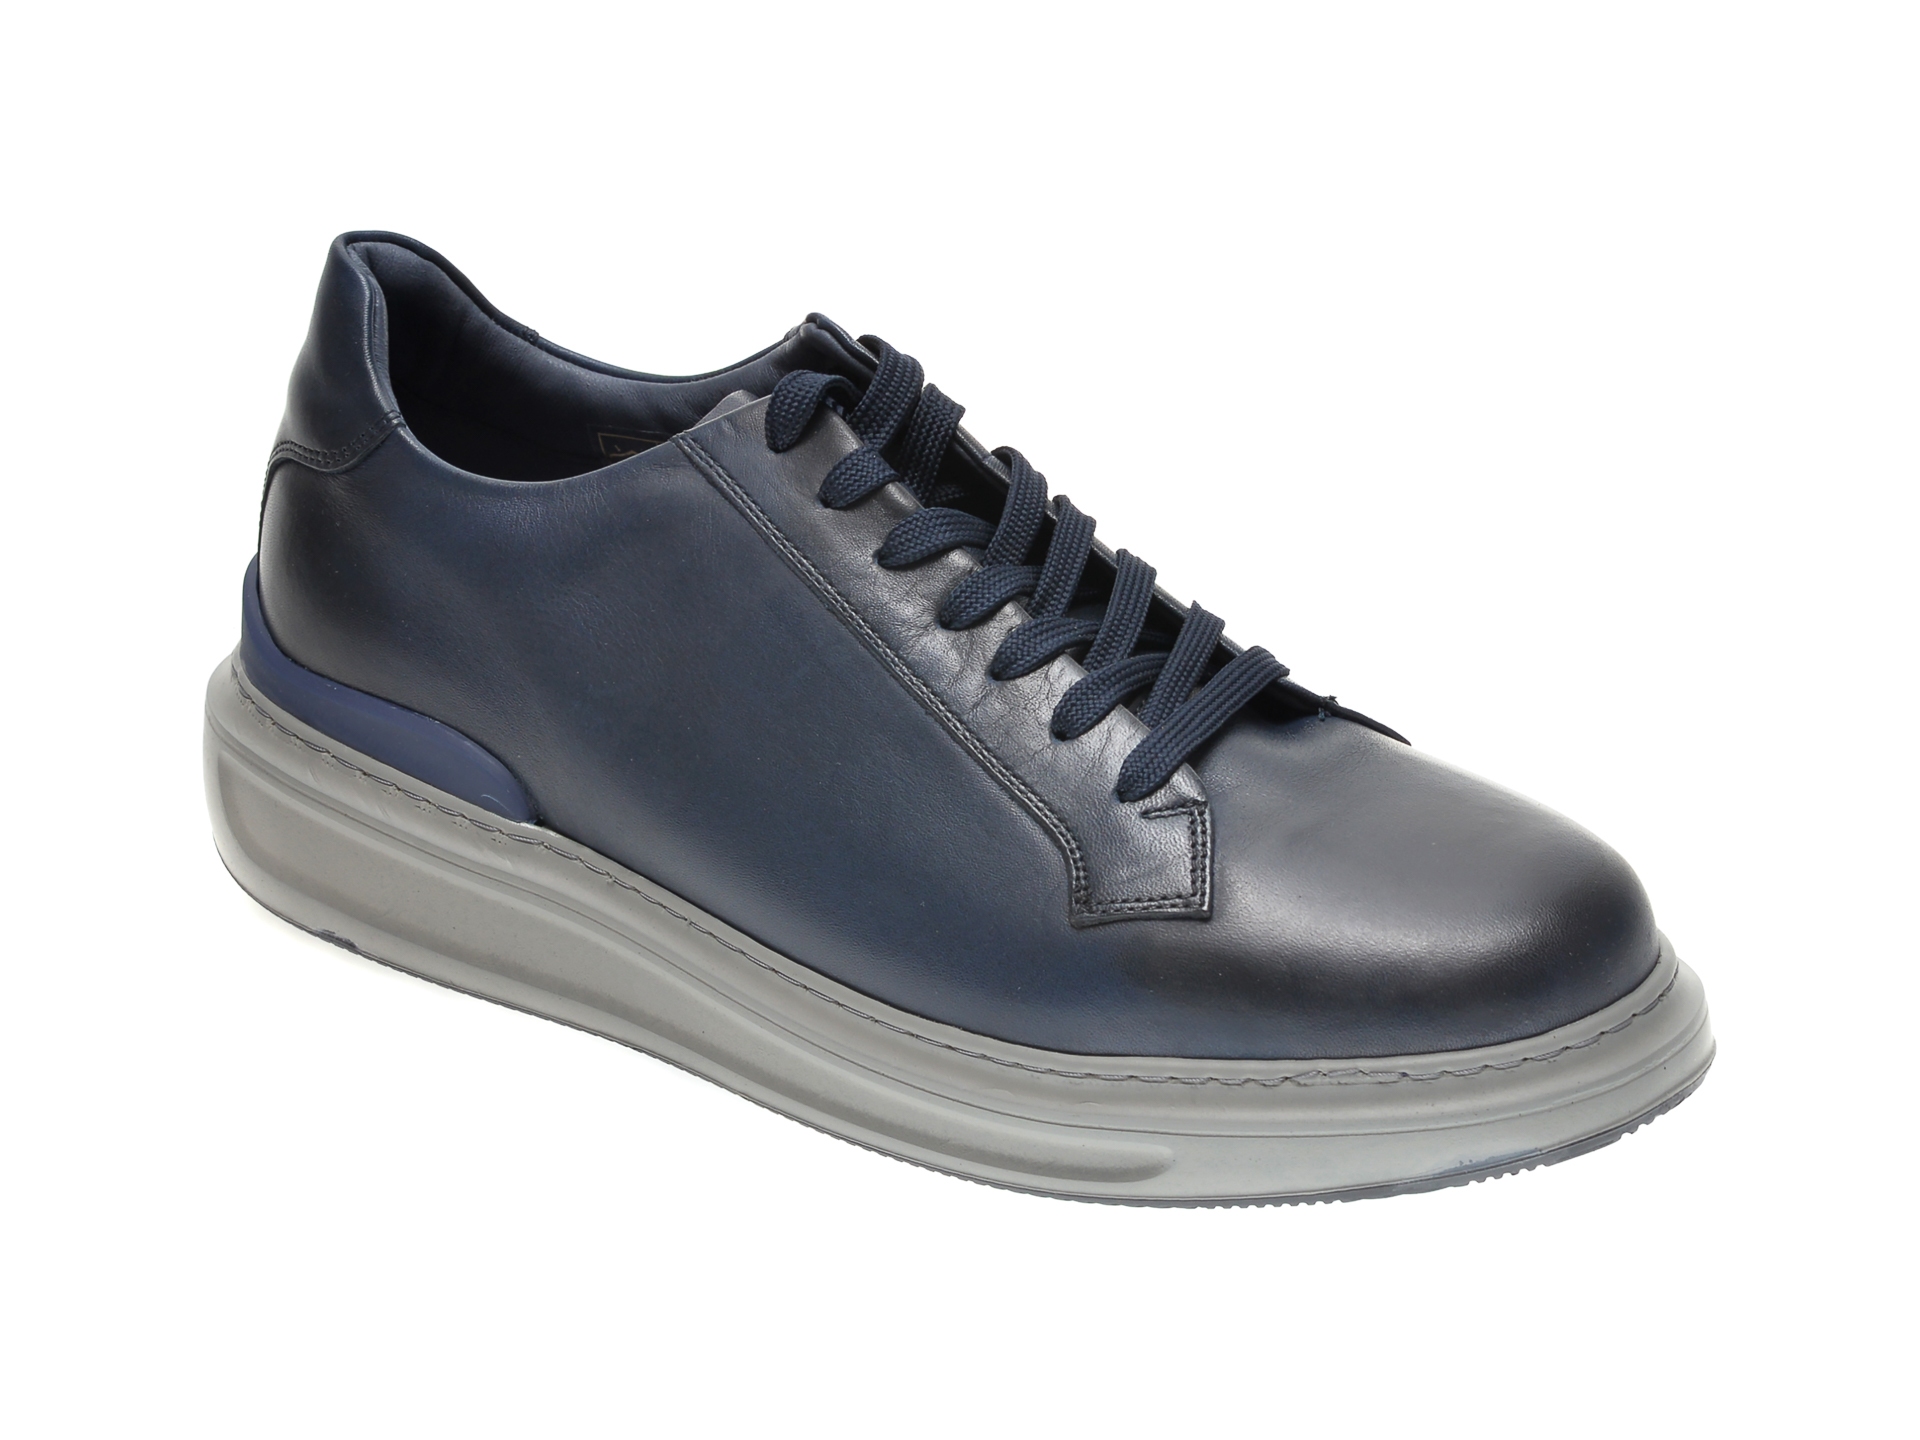 Pantofi OTTER bleumarin, 9155, din piele naturala imagine